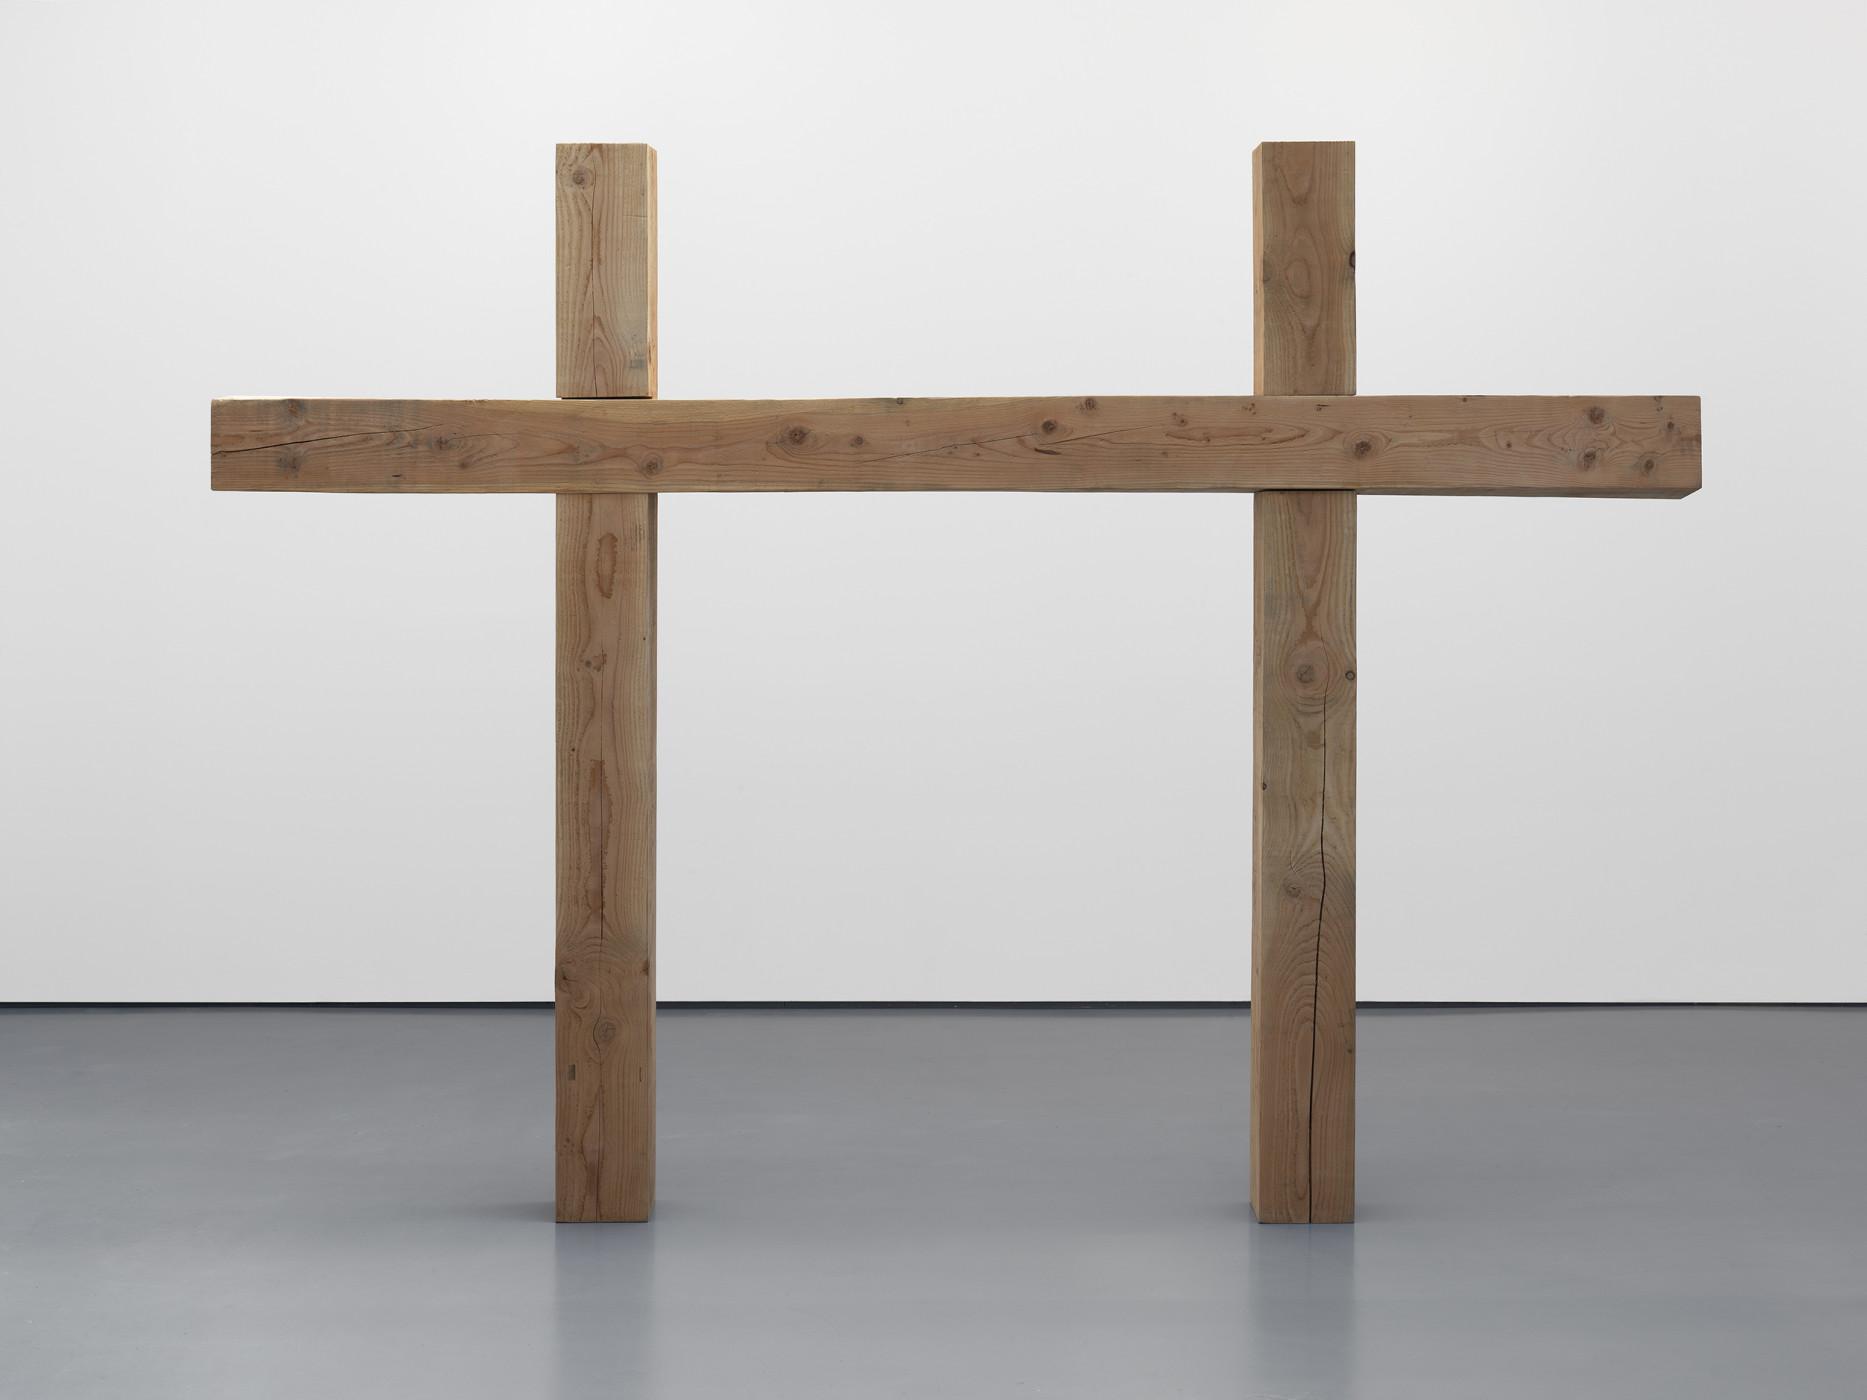 "<div class=""title""><em>Crucifix for Two</em>, 2010</div><div class=""medium"">Douglas fir</div><div class=""dimensions"">205.0 x 280.5 x 18.2 cm<br />80 3/4 x 110 3/8 x 7 1/8 in.</div>"